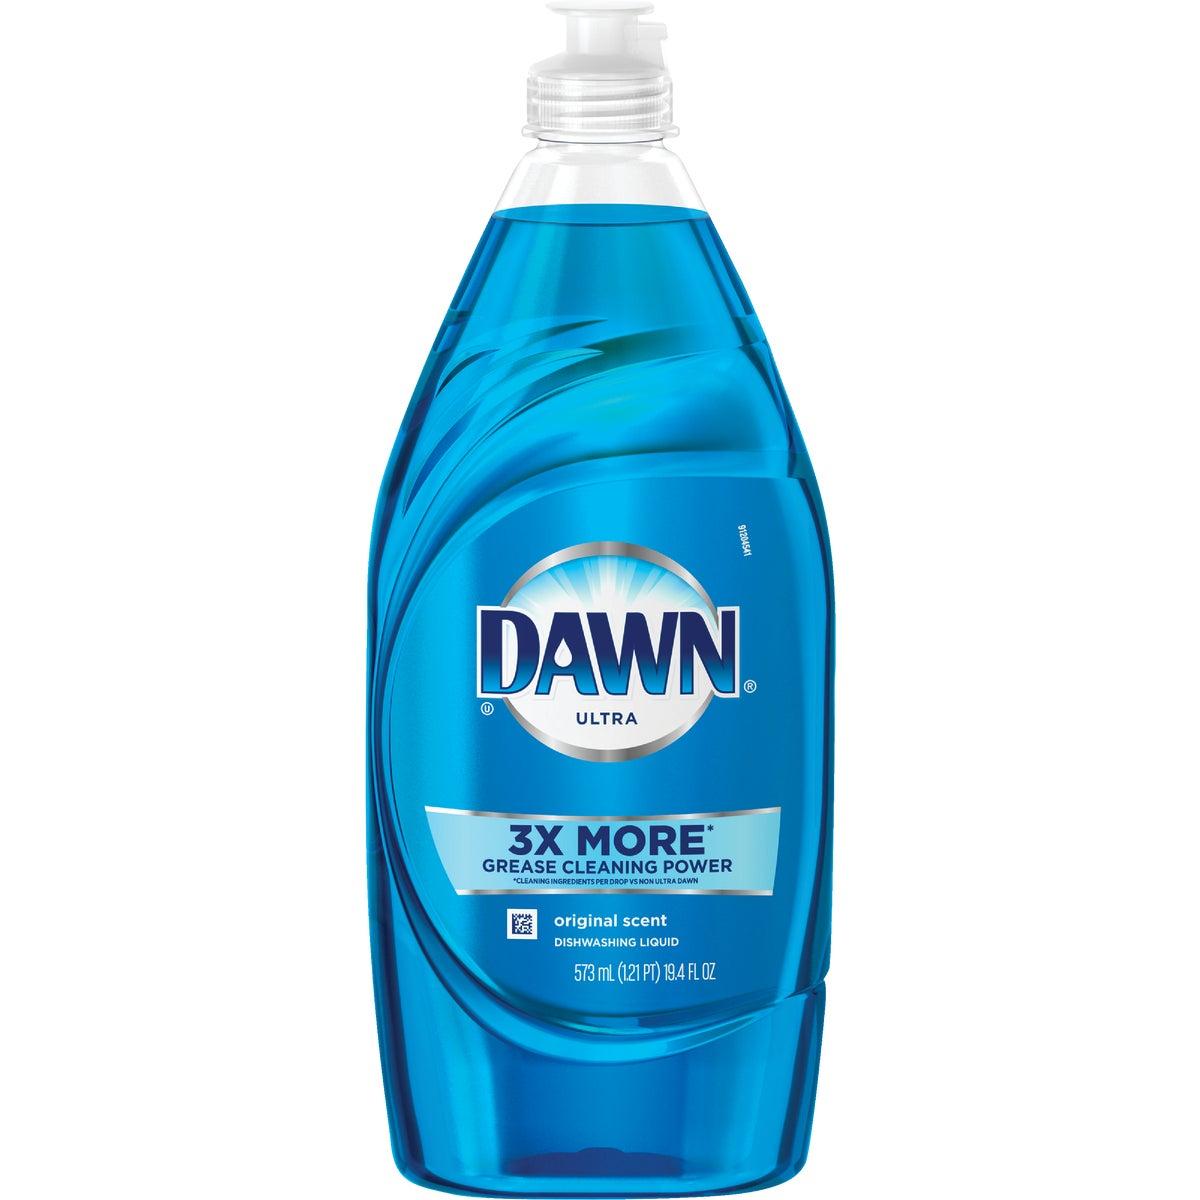 Procter & Gamble 24OZ ORIG DAWN DISH SOAP 22205